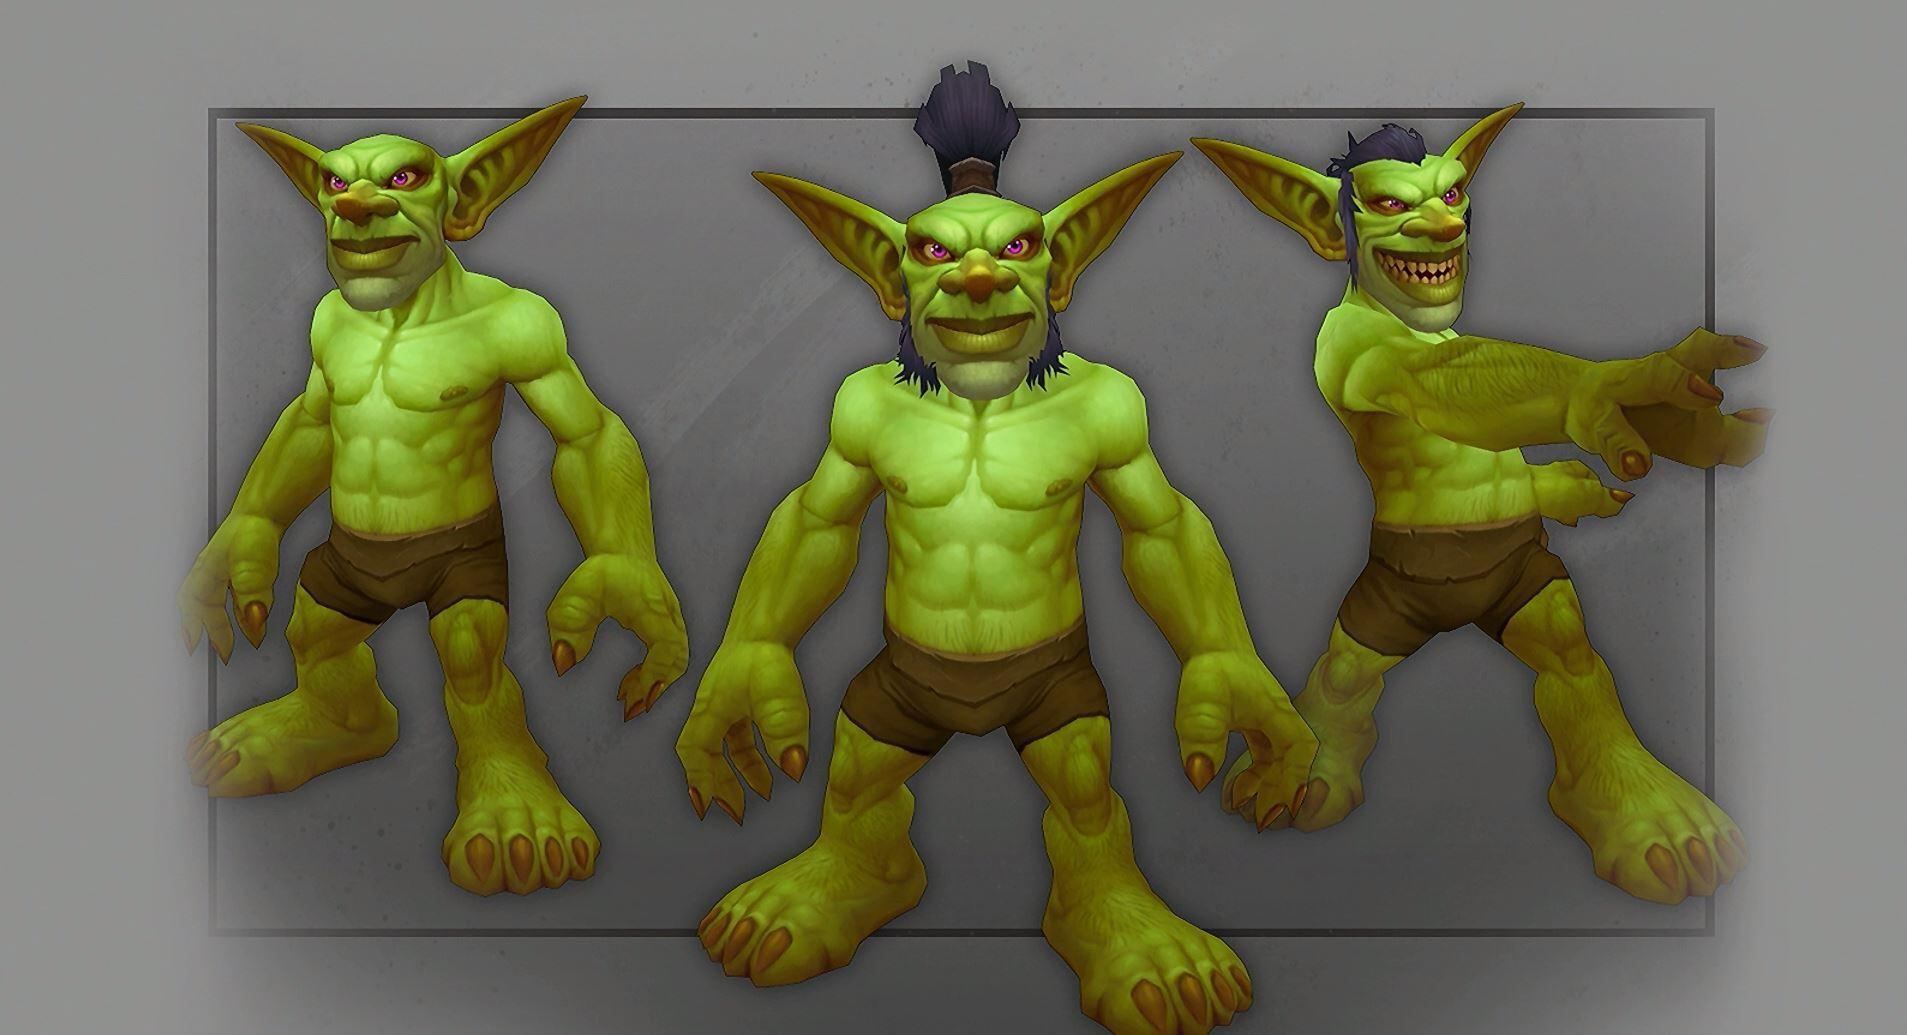 goblins.JPG.9463604e9195ac9b881d75815c72